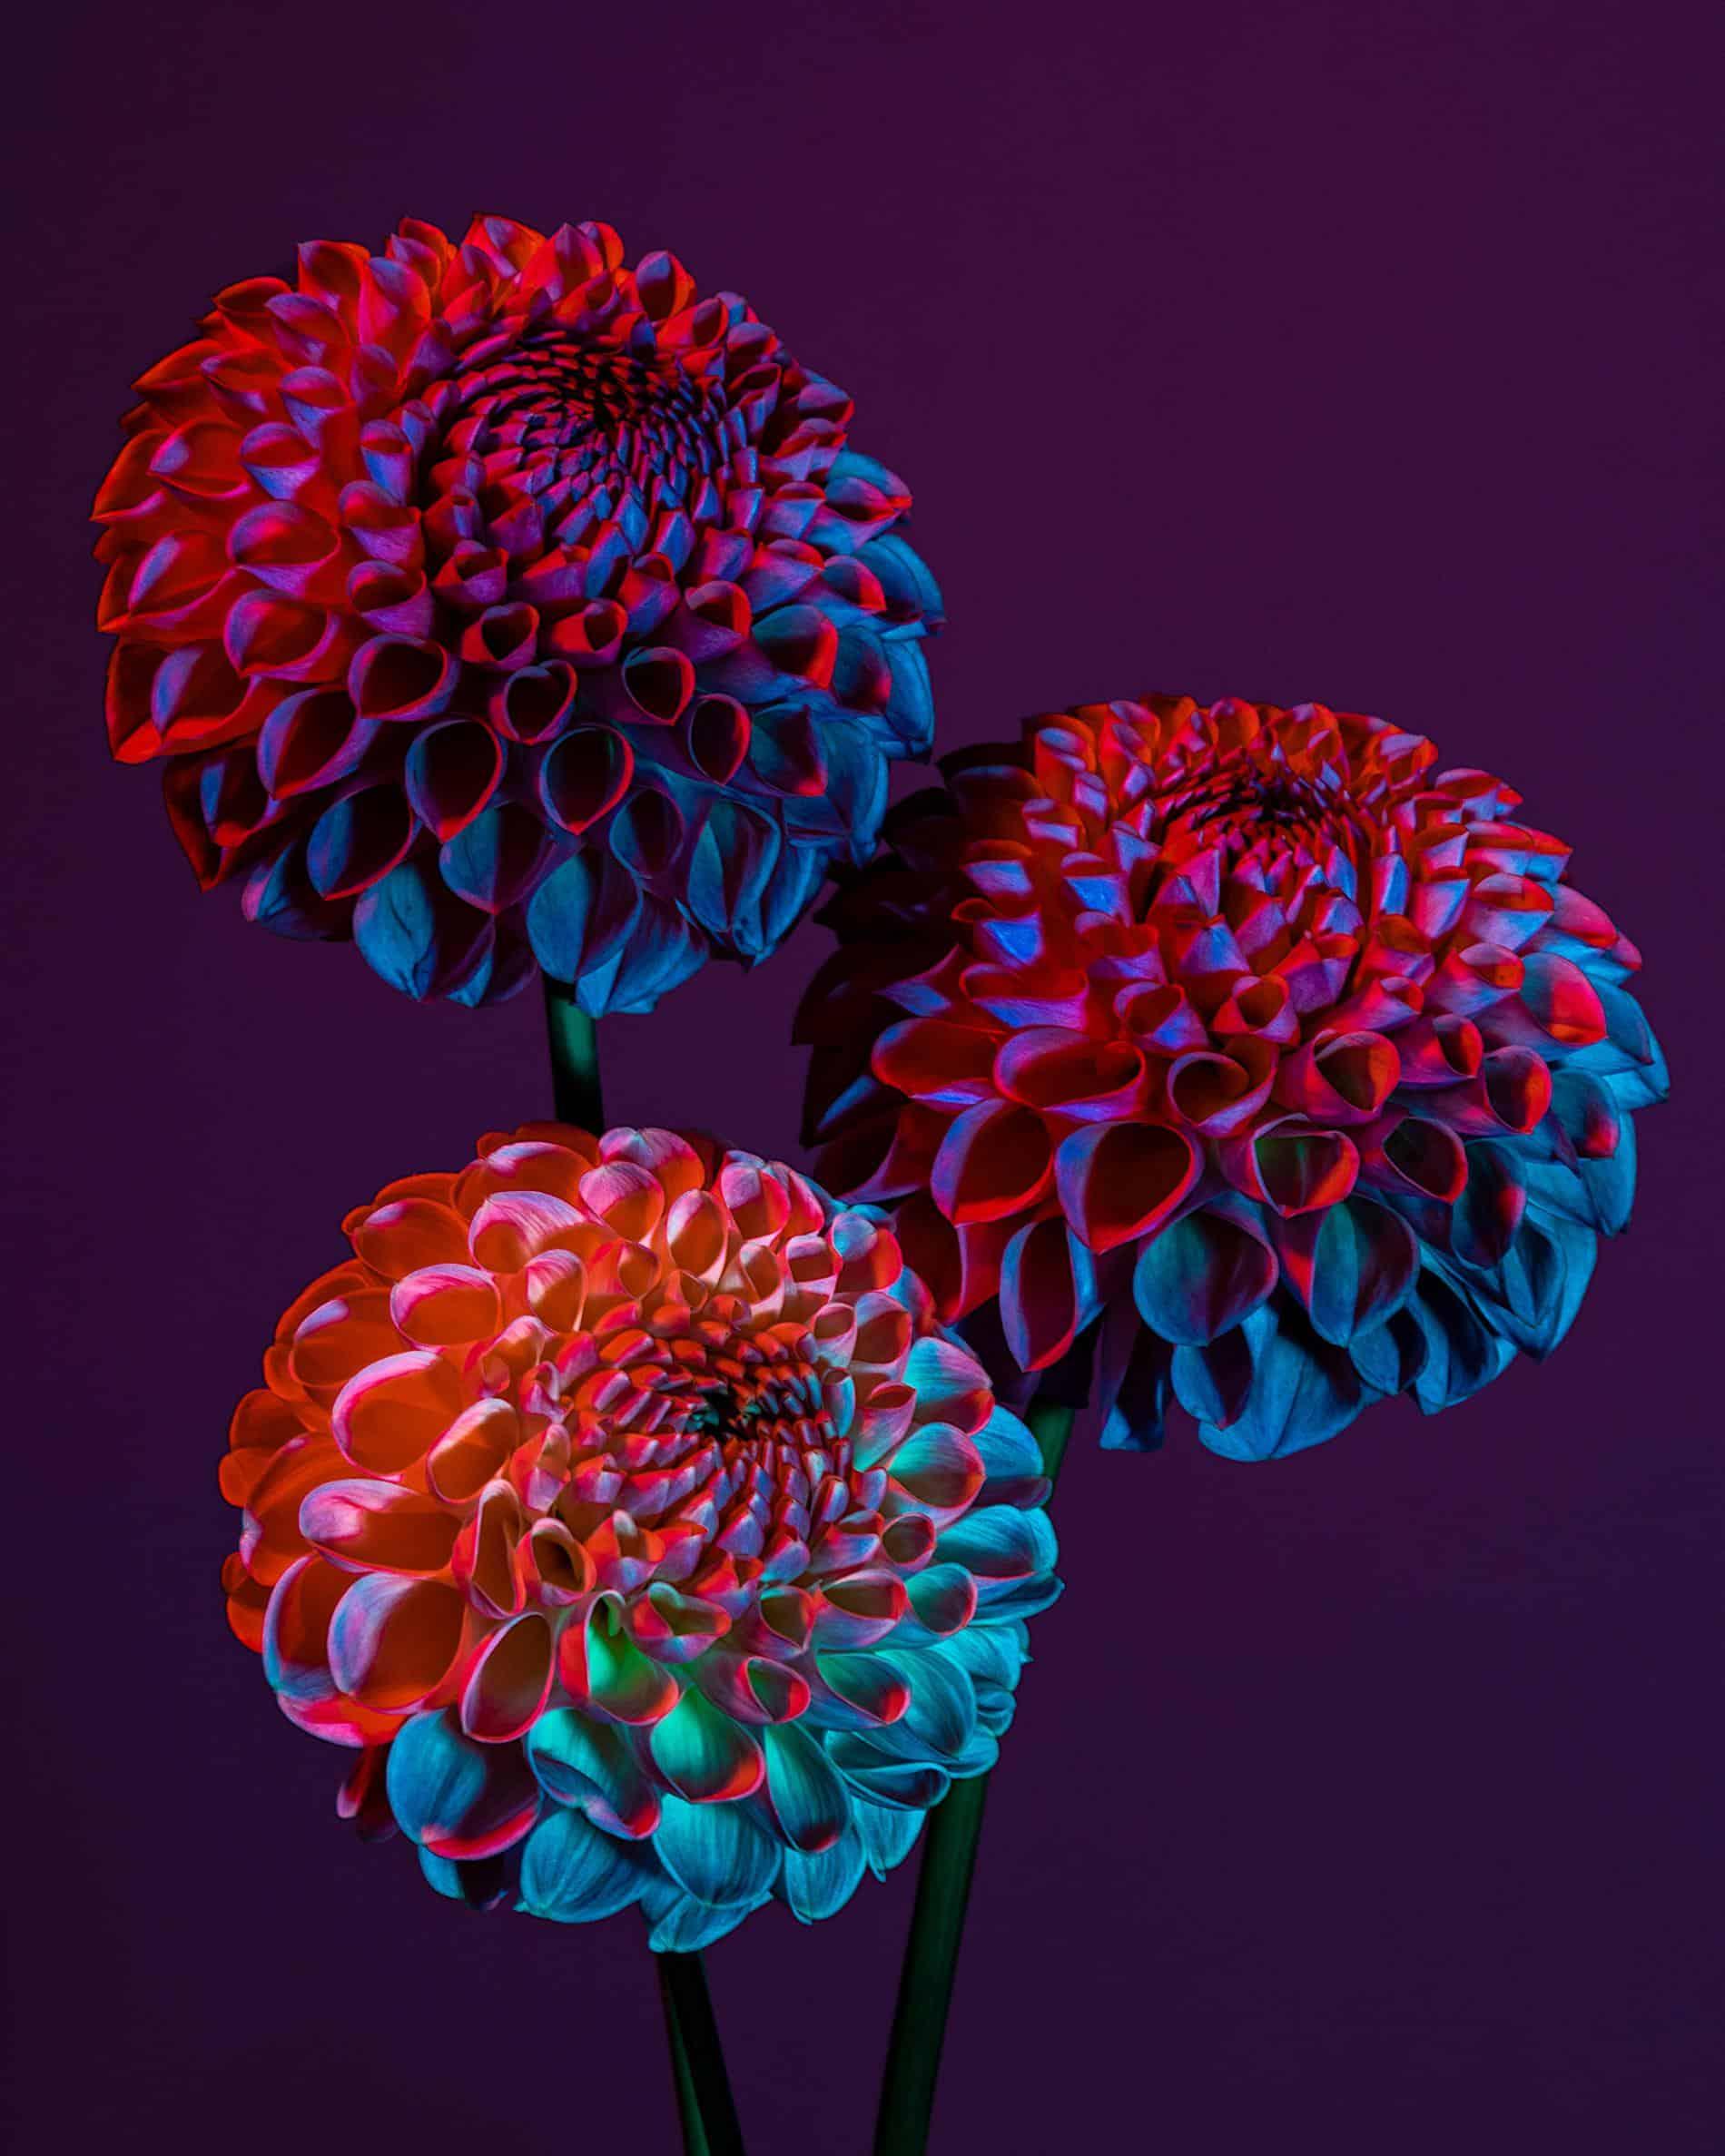 rickert flores botanica de otro mundo dhalias